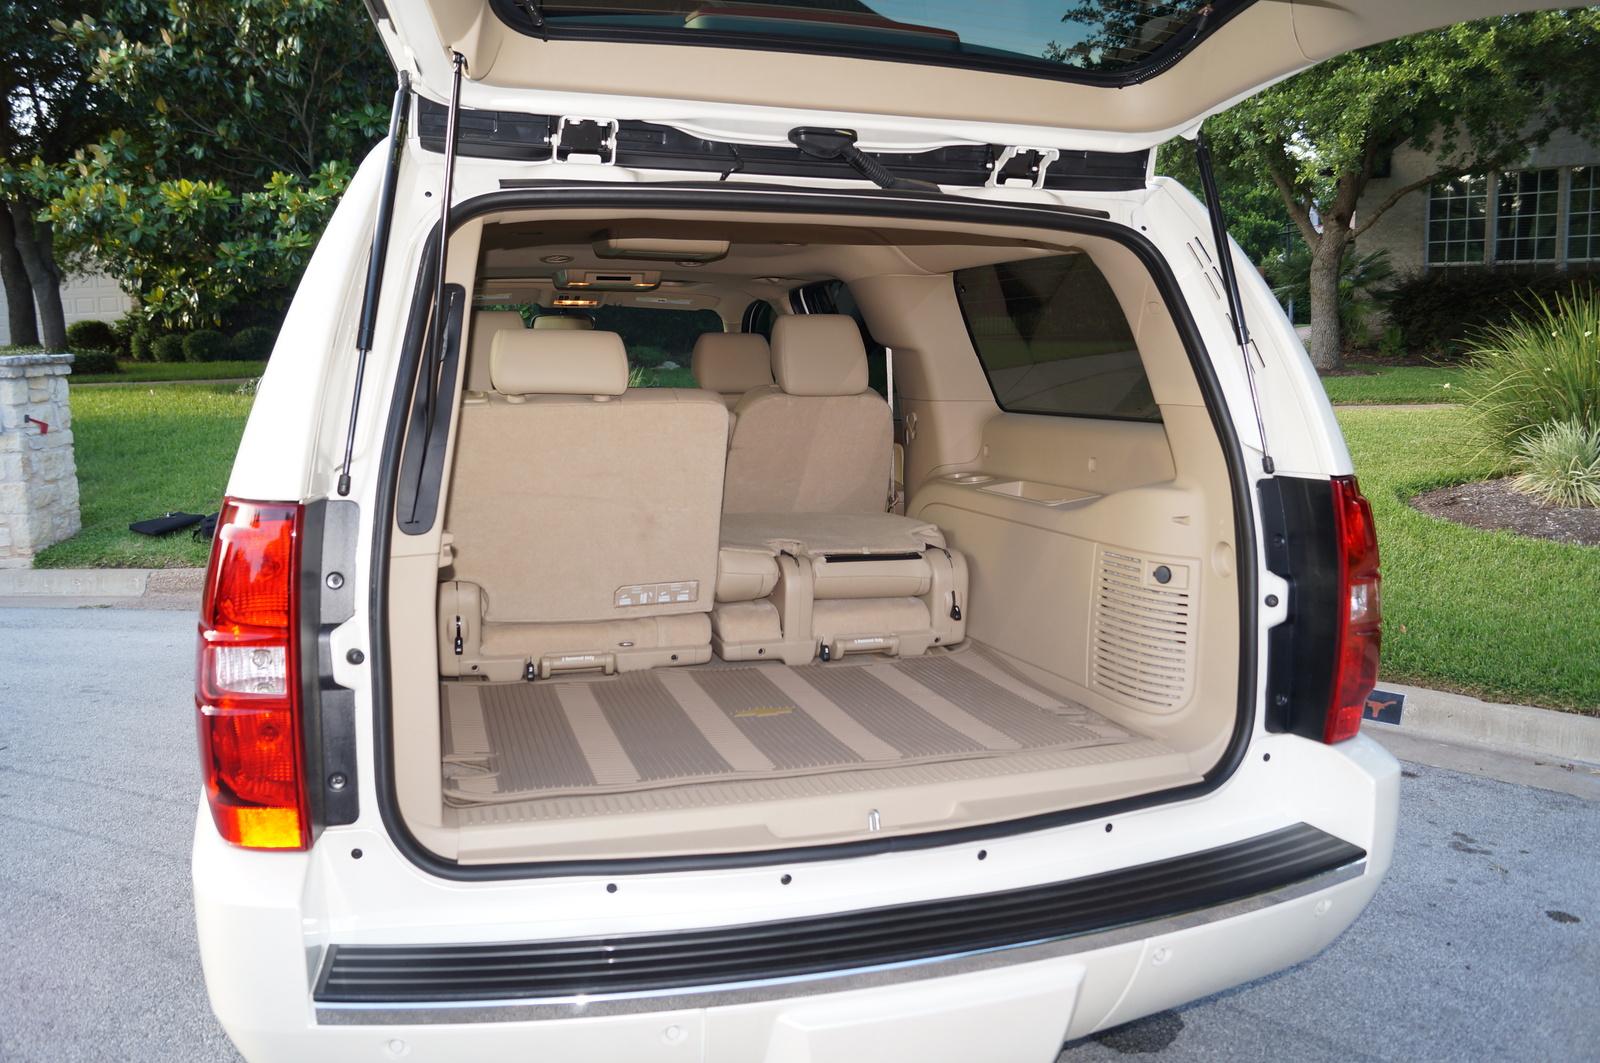 2014 Chevy Suburban Interior Picture of 2013 chevrolet